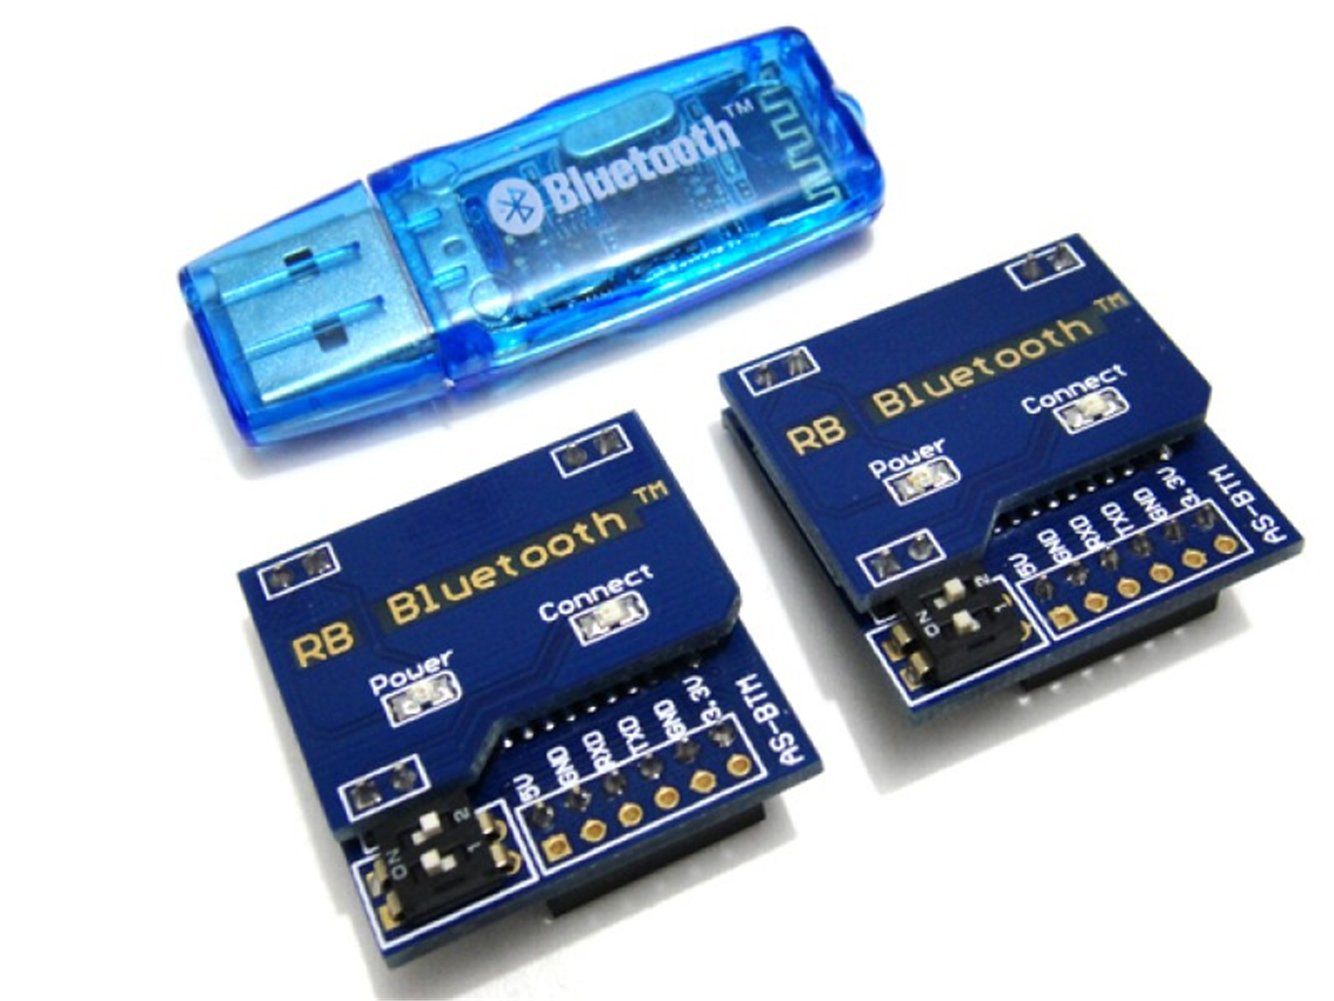 RB Bluetooth Transceiver Kit